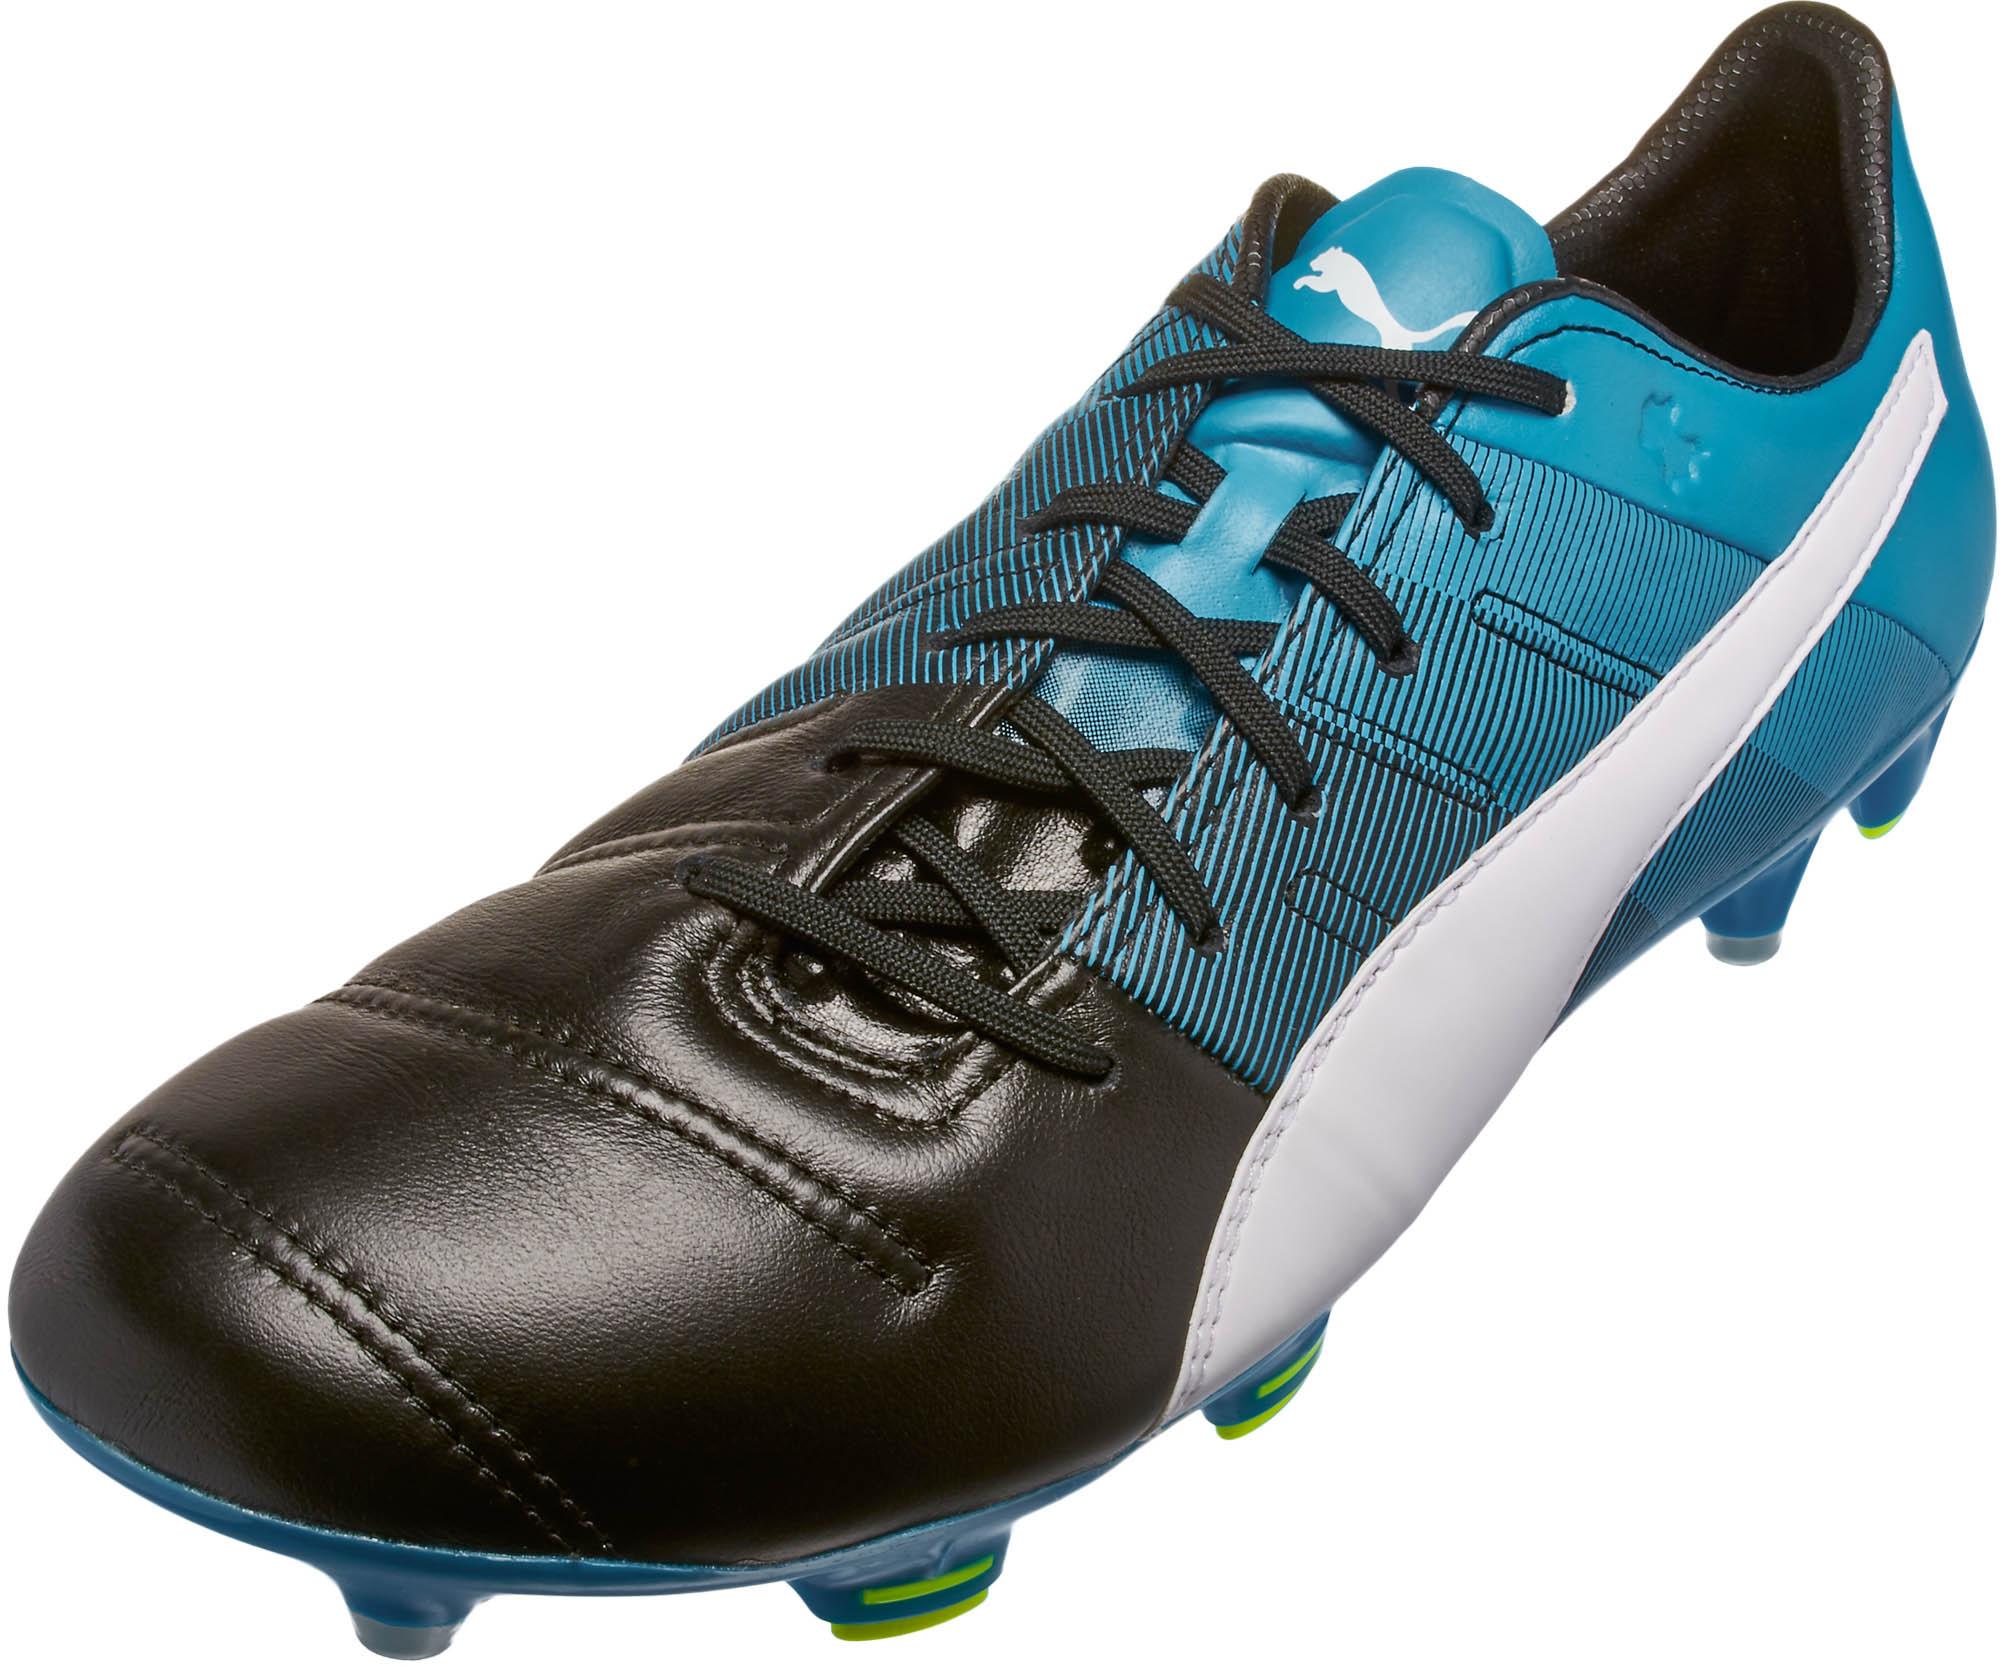 Puma evoPOWER 1.3 FG Cleats - Black evoPOWER Soccer Cleats 9f59def2a